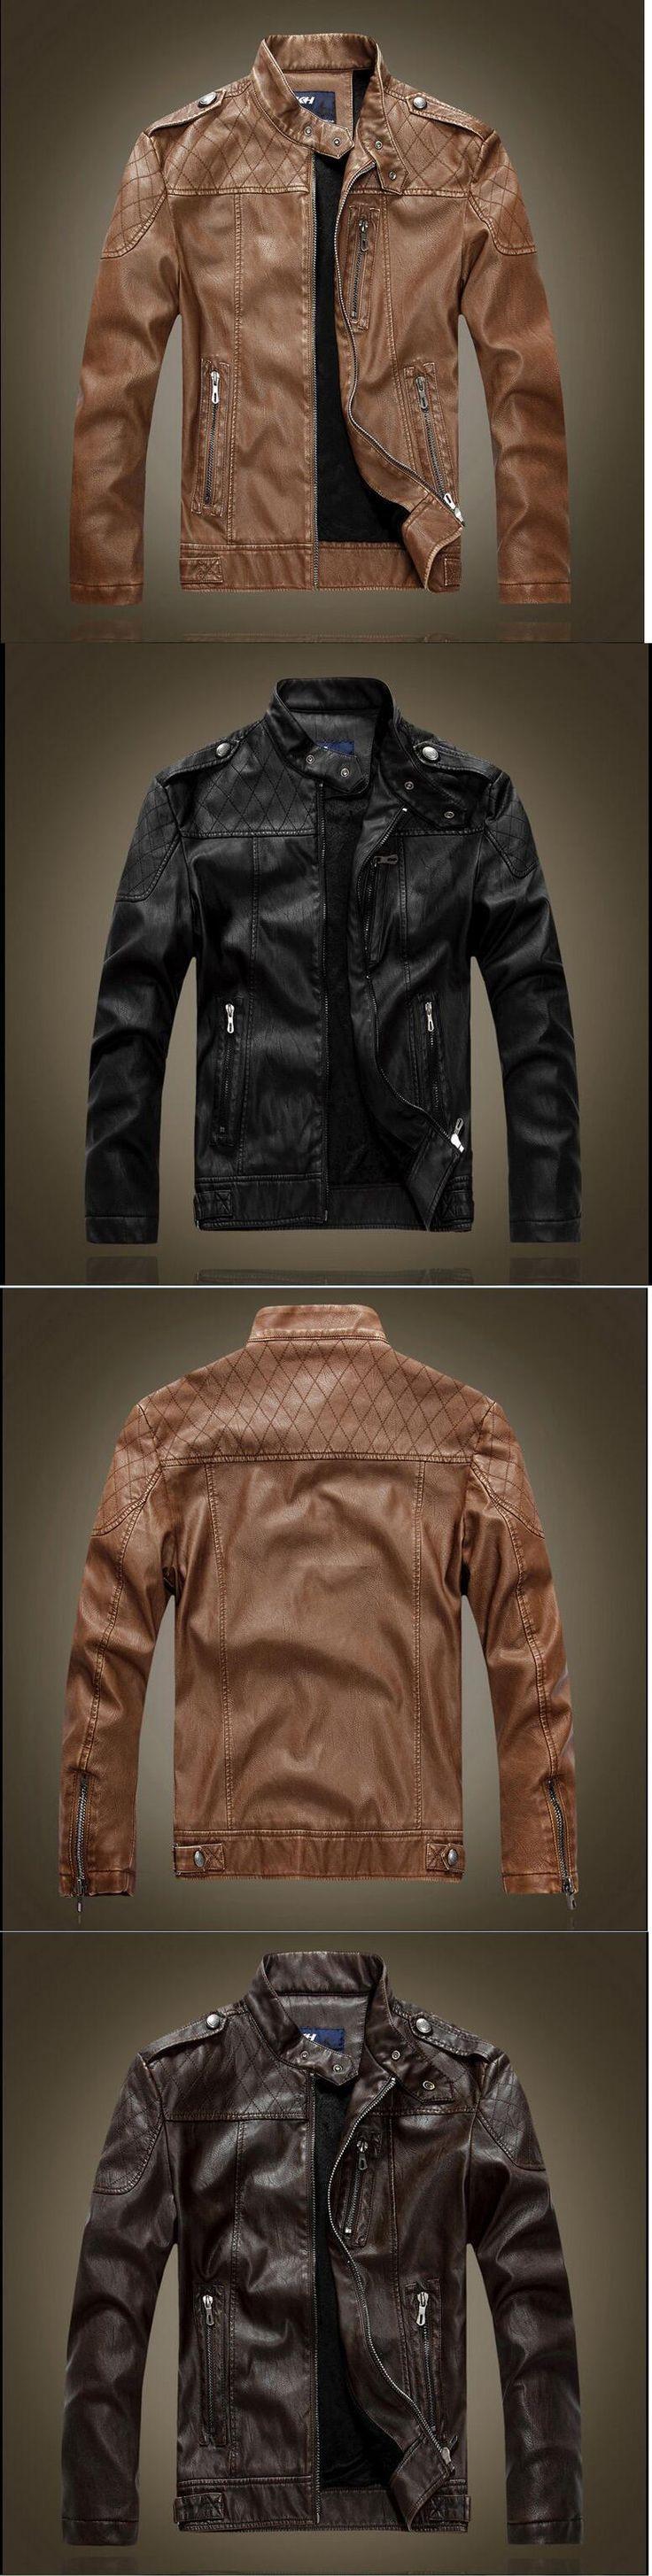 Men Coats And Jackets: 2017Men S Genuine Lambskin Leather Jacket Black Slim Fit Biker Motorcycle Jacket -> BUY IT NOW ONLY: $31.69 on eBay!